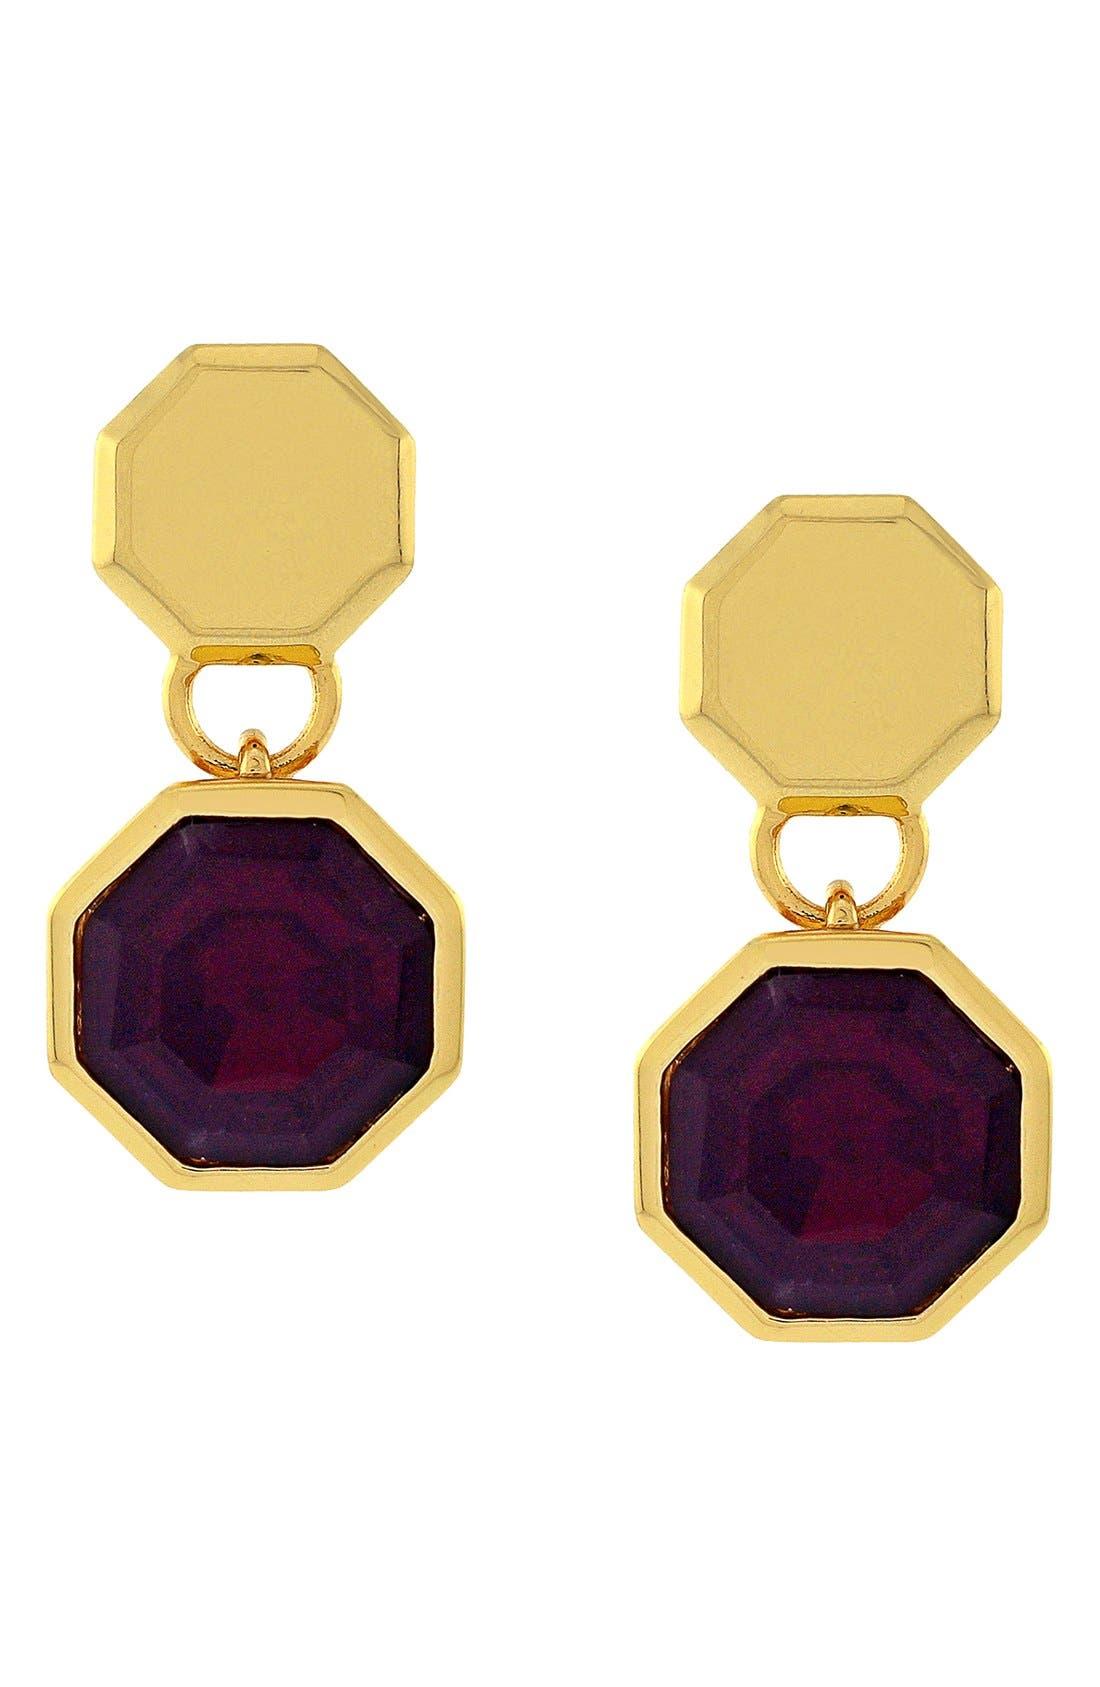 Alternate Image 1 Selected - Louise et Cie 'Bleecker Street' Geometric Drop Earrings